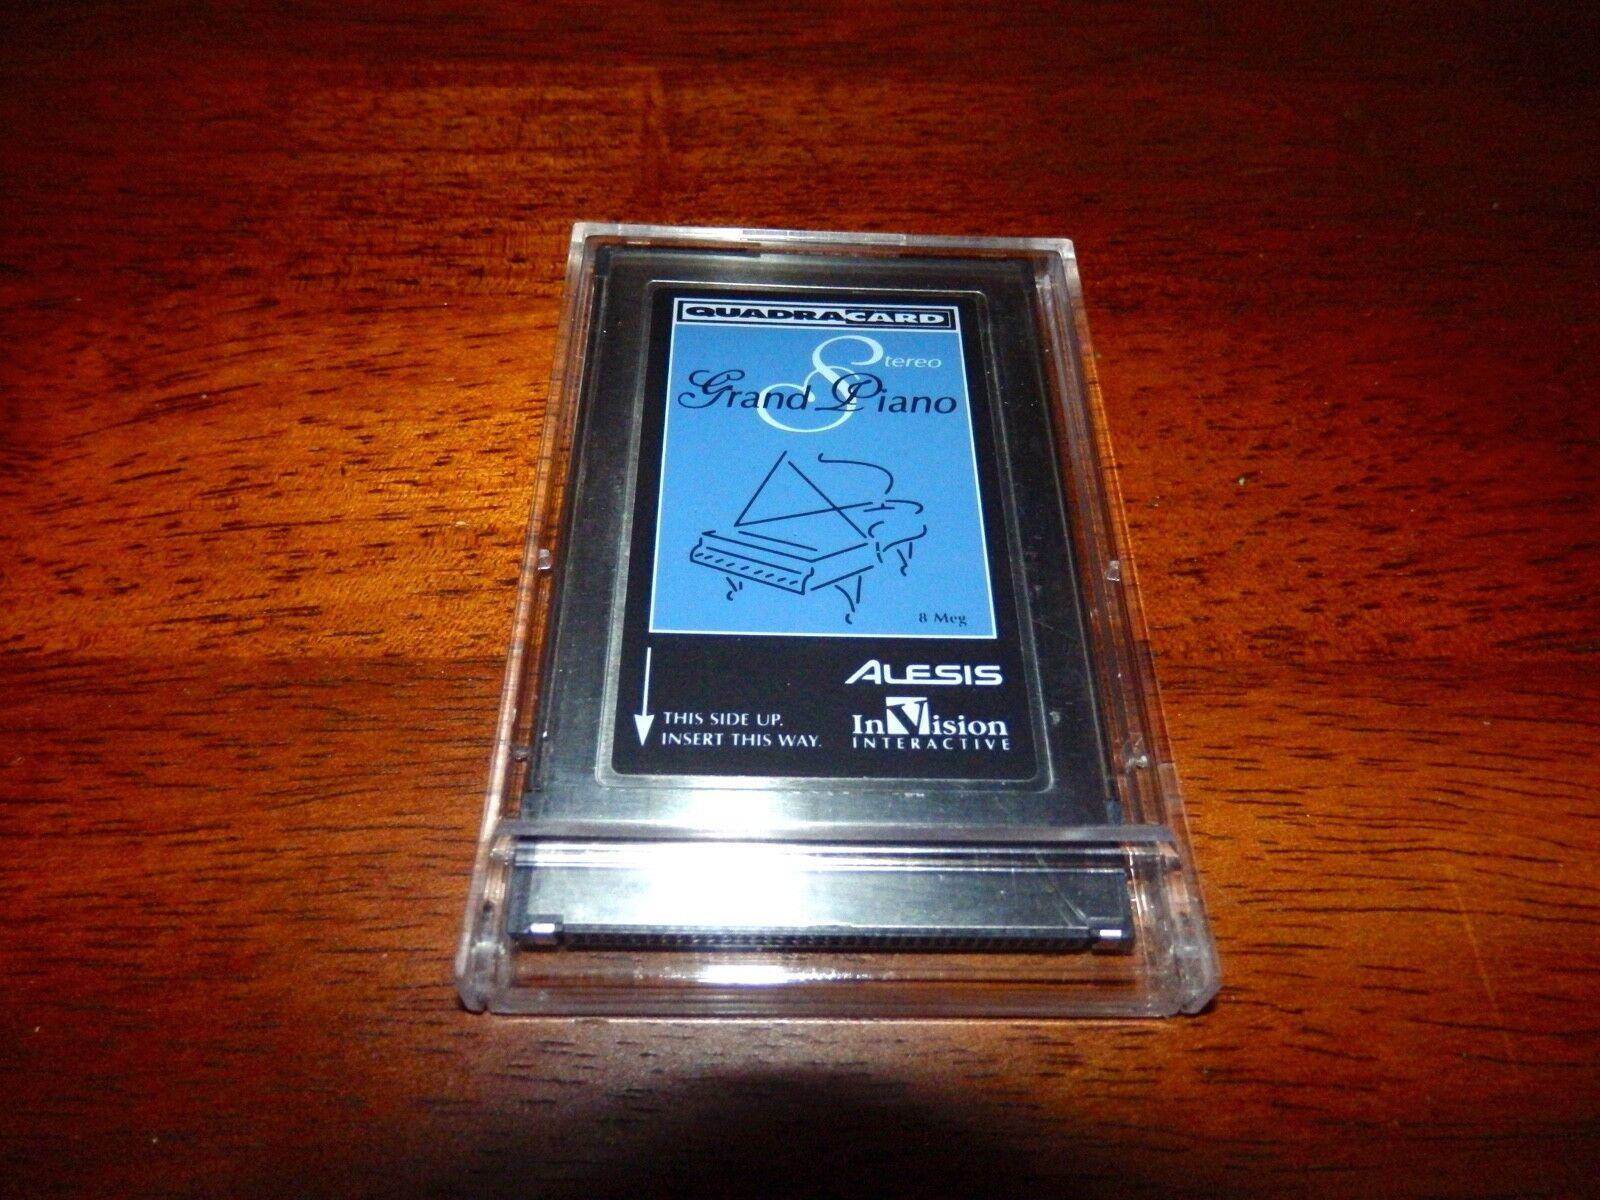 Alesis   InVision Quadra Card 8MB STEREO GRAND PIANO sehr saubere Kartenarbeit s100%